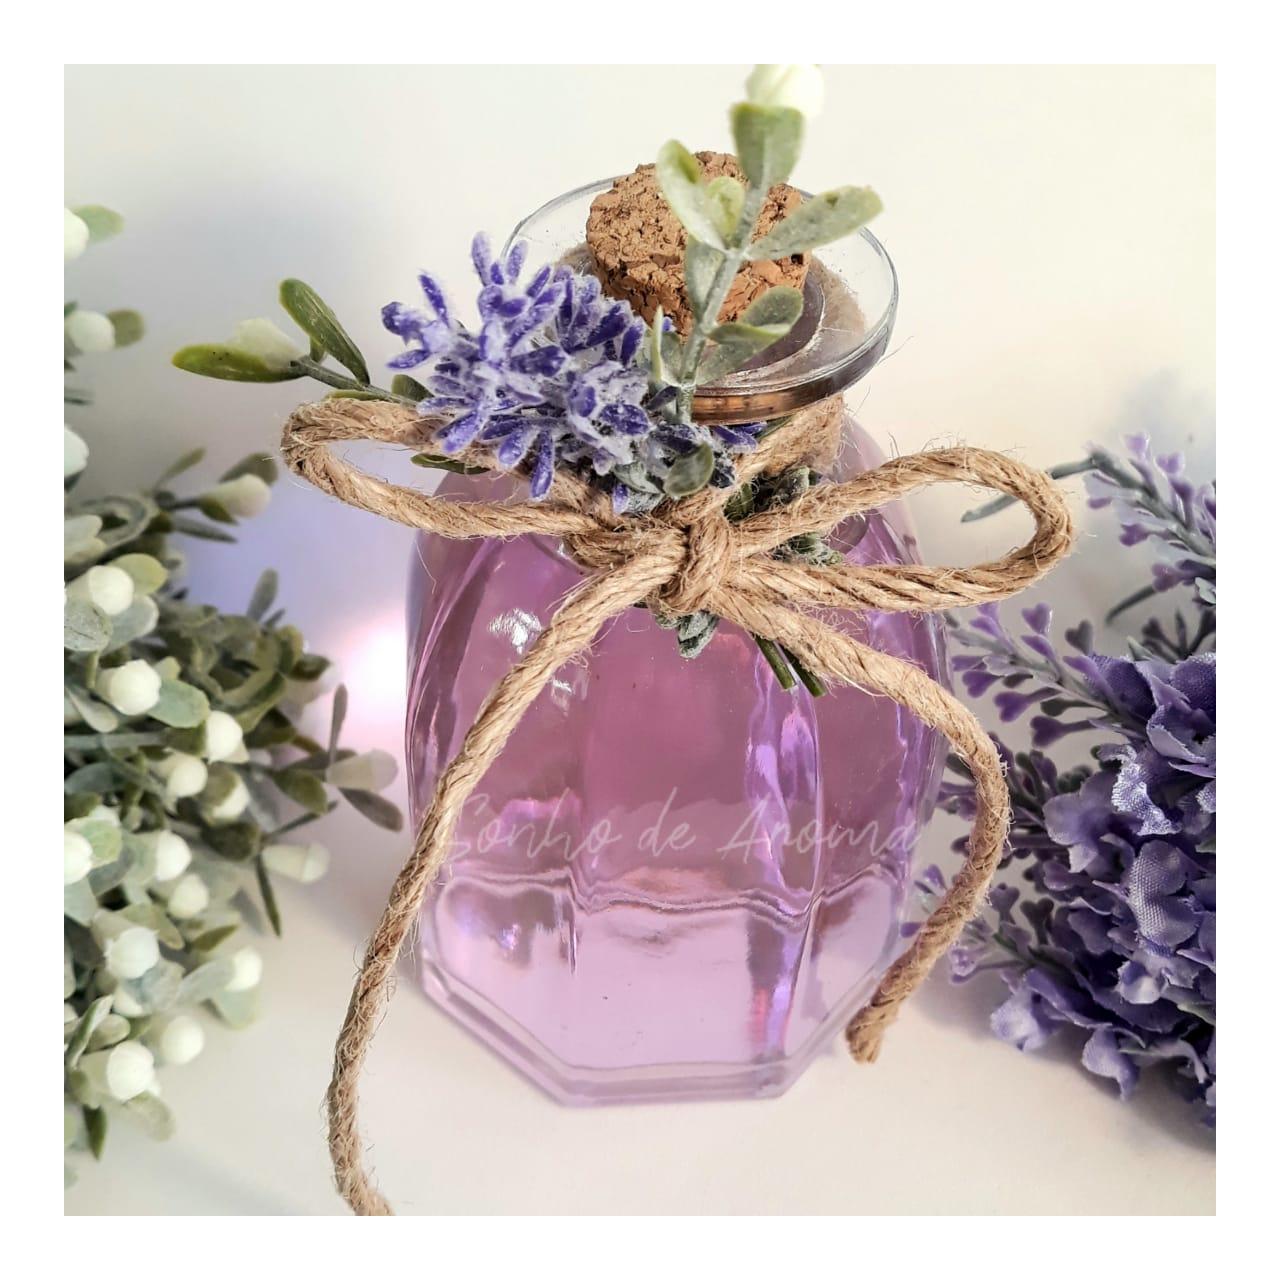 Sonho de Aroma  – Perfumaria de Ambientes